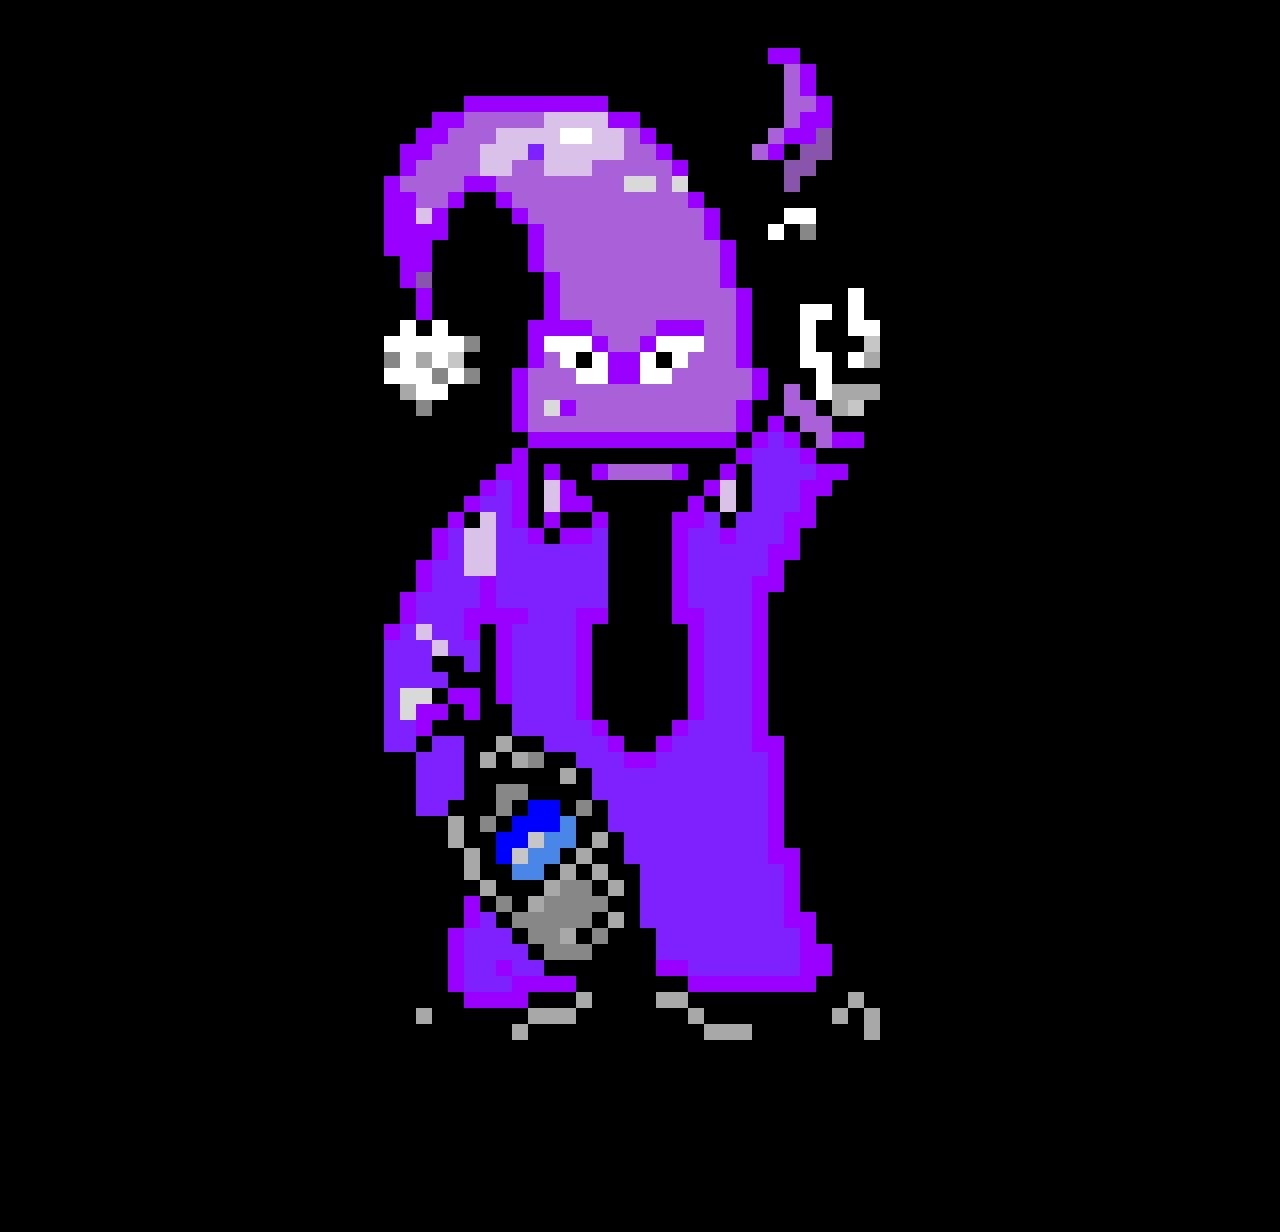 happy happiest (insane cultist) colored battle sprite